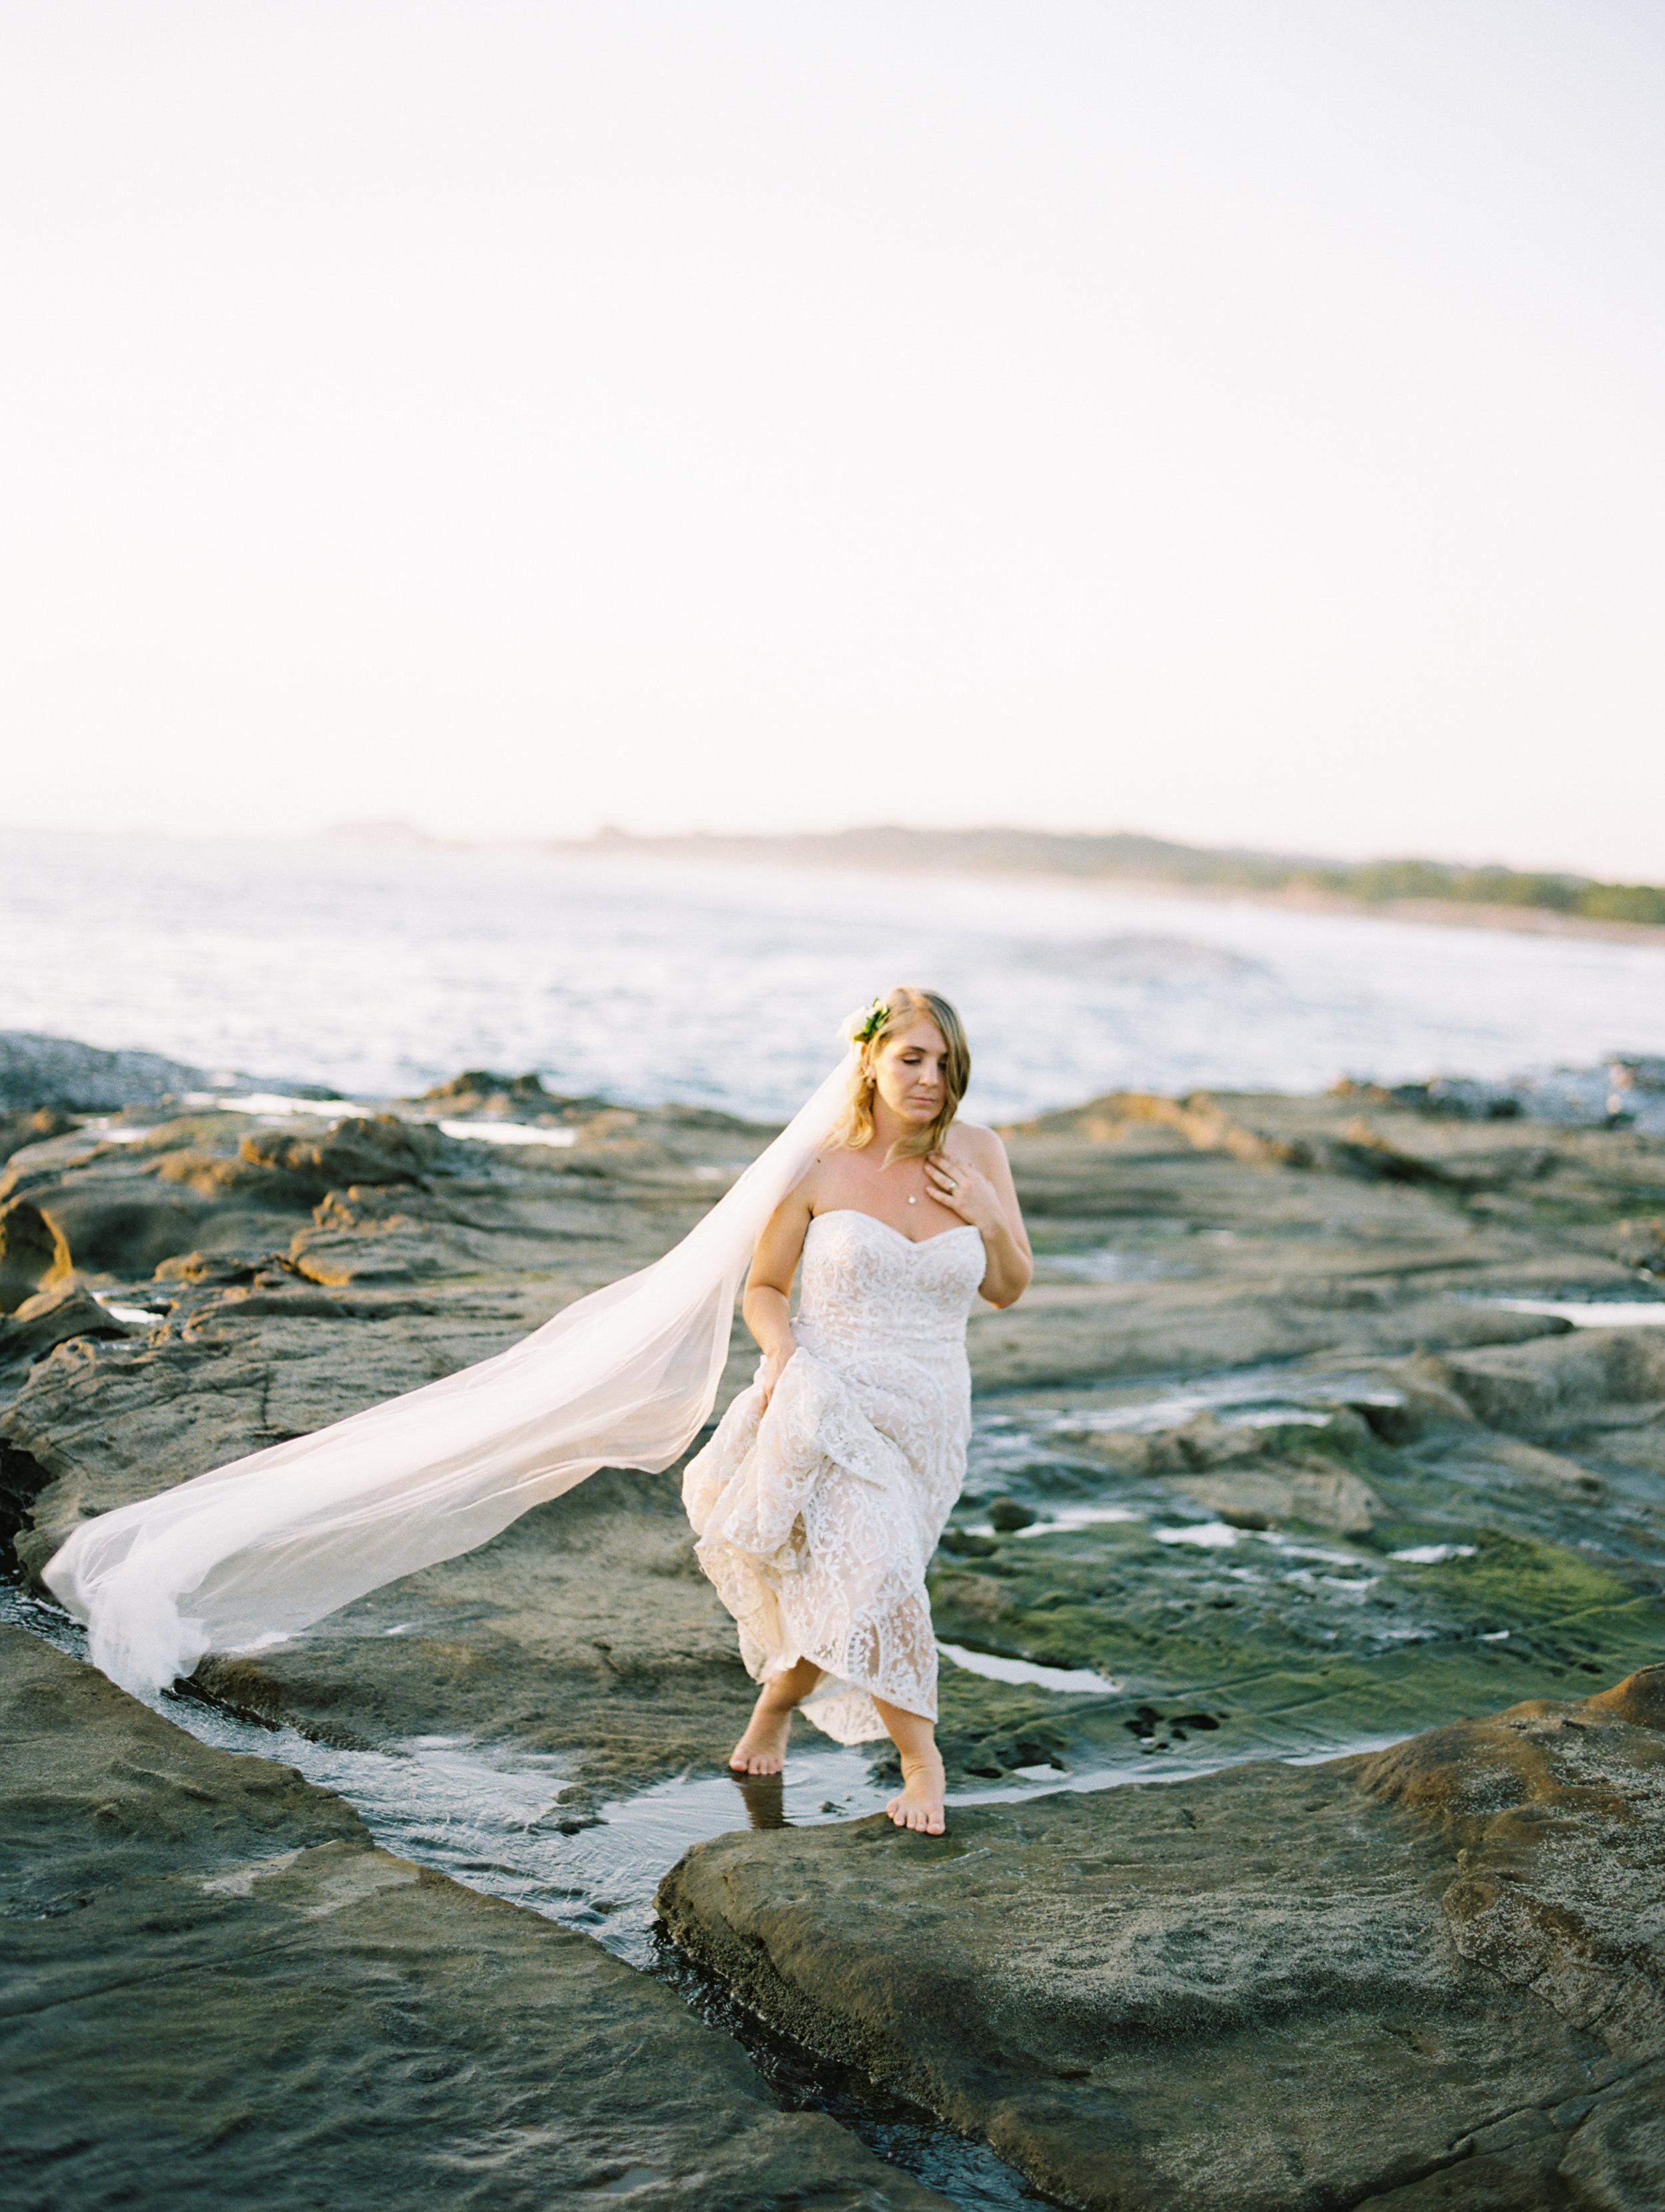 519-fine-art-film-photographer-destination-wedding-nicaragua-jacob+cammye-brumley & wells.jpg